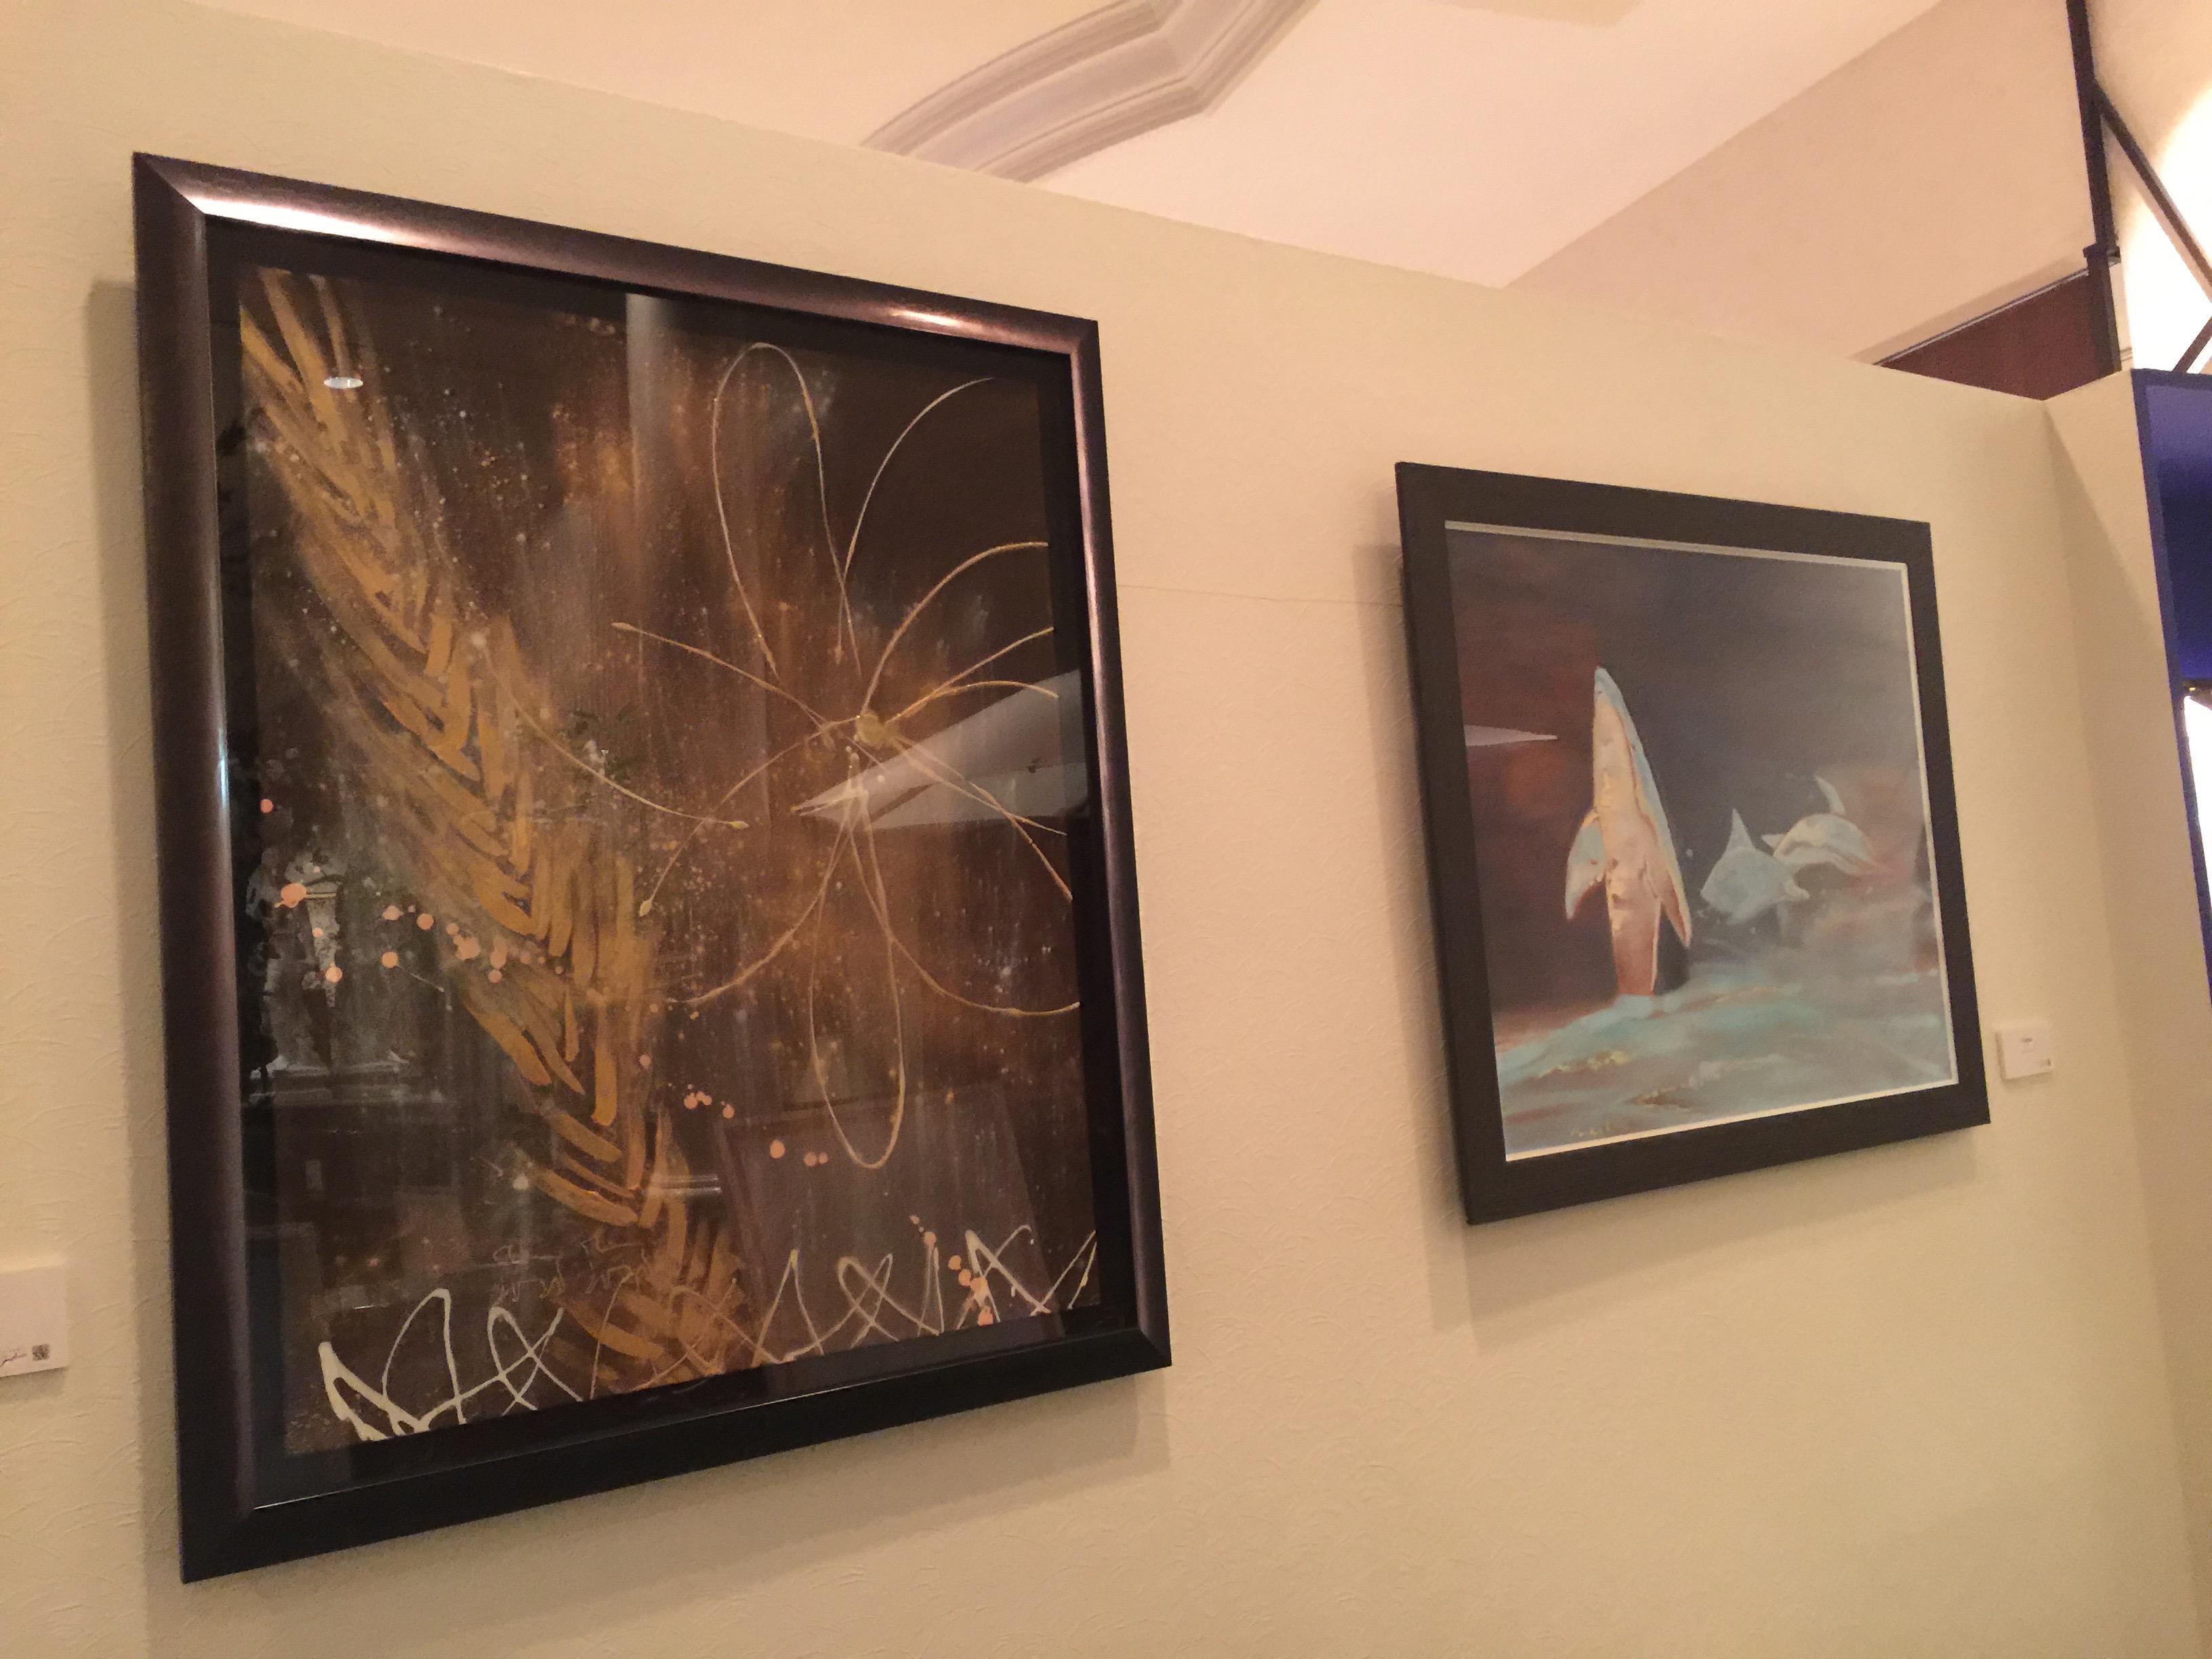 Nostalgia - 望郷 -  (left: 名古屋マリオット個展より)<br /> Ocean (right: 名古屋マリオット個展より)